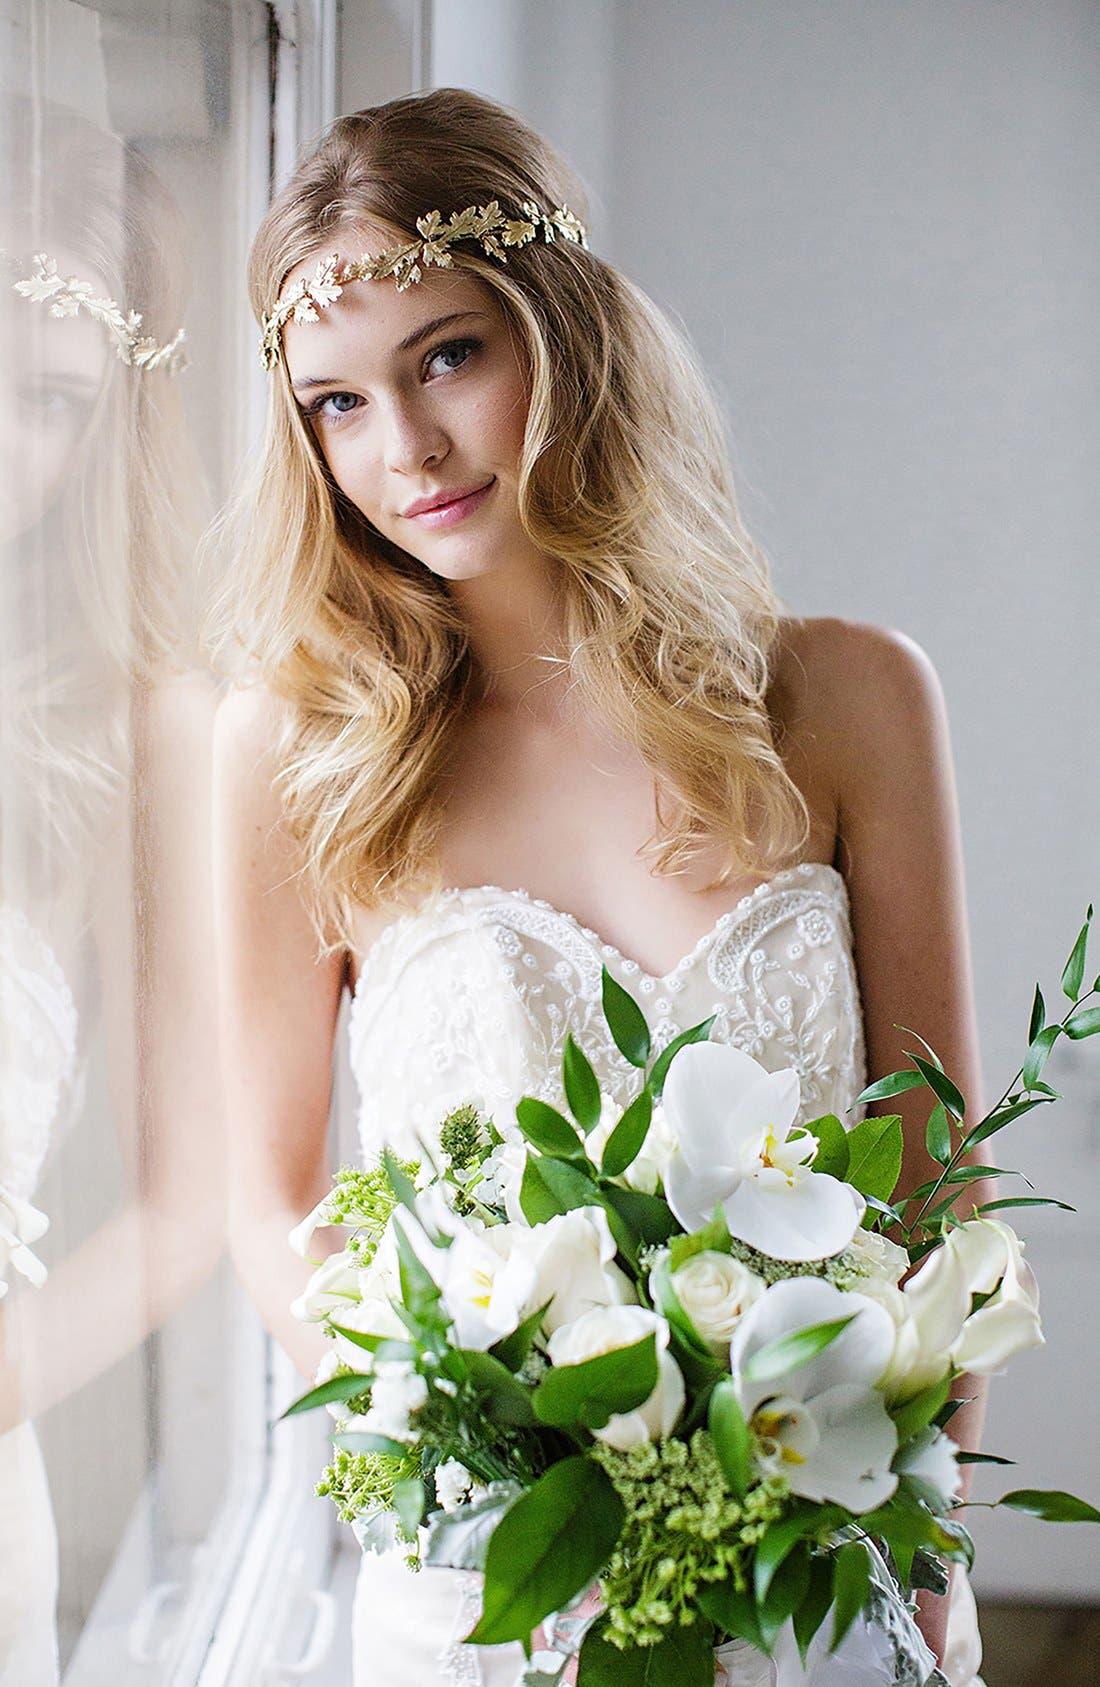 Alternate Image 1 Selected - Brides & Hairpins Paula Grecian Leaf Halo & Sash